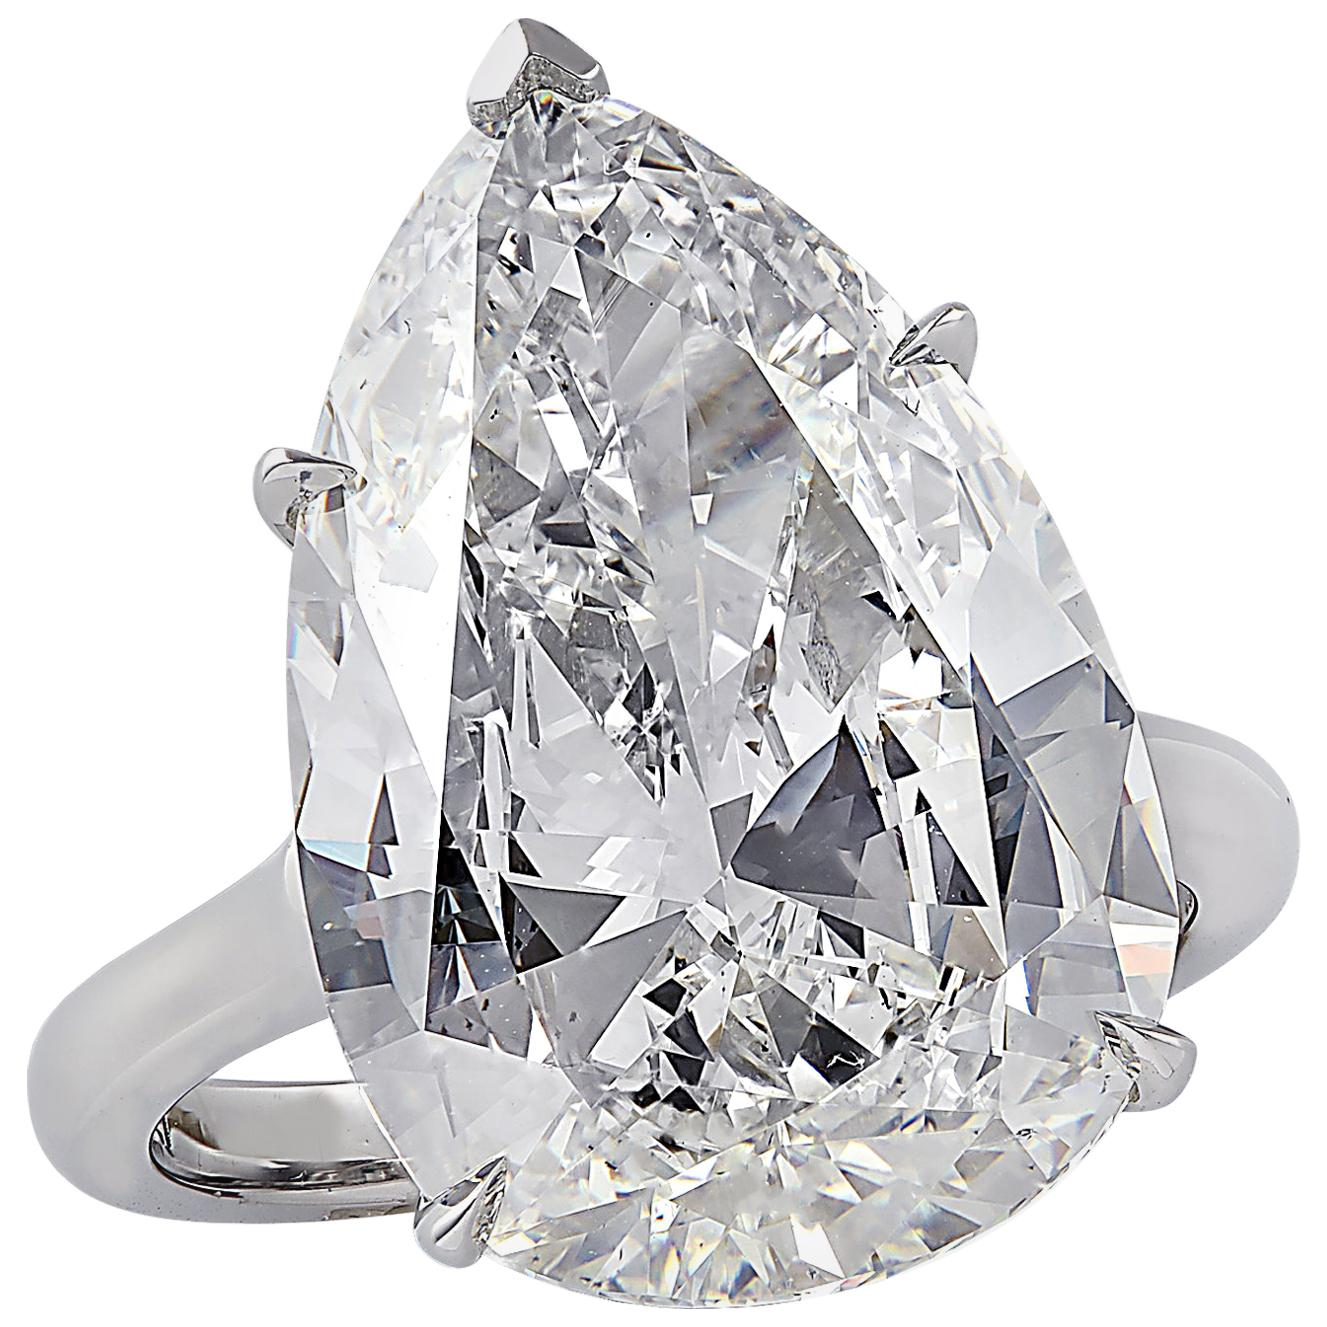 Vivid Diamonds GIA Certified 10.17 Carat Diamond Engagement Ring